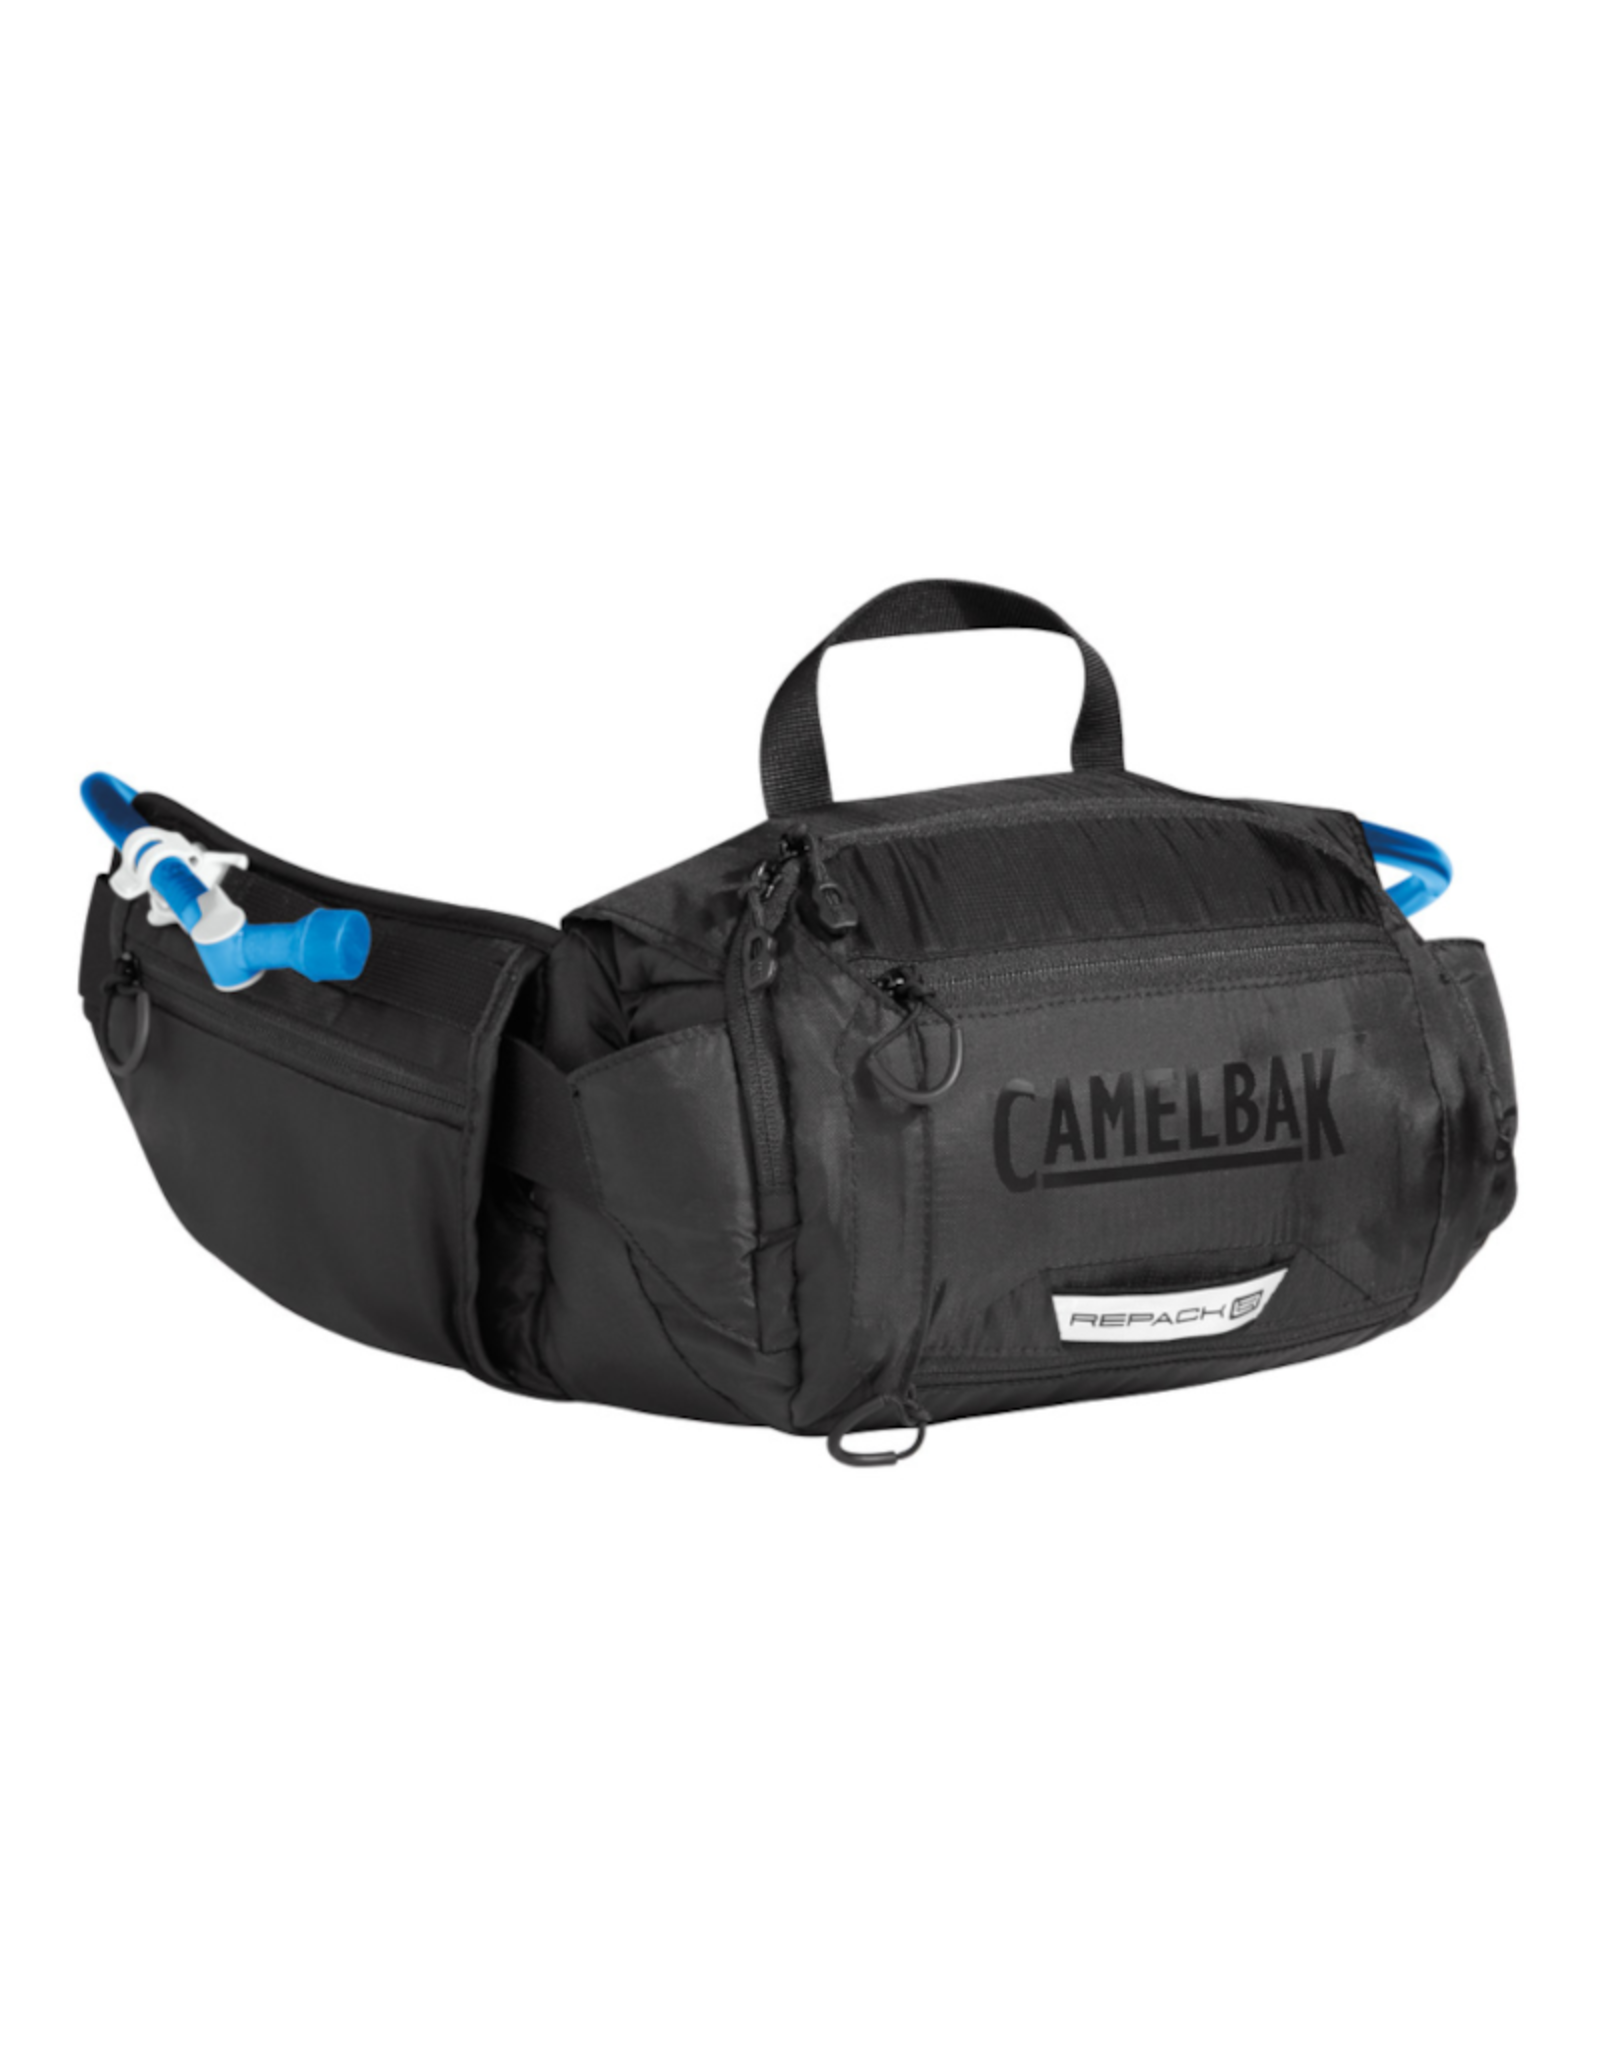 Camelbak REPACK LR 4 50 OZ BLACK